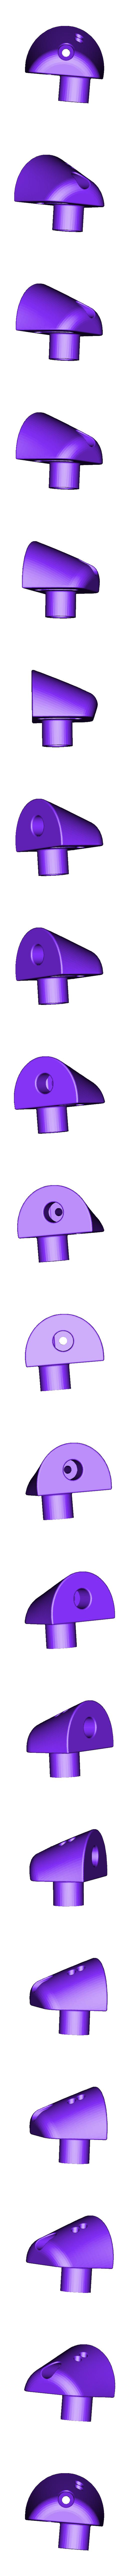 pouce_-_m%C3%A9tacarpe_3A.stl Download free STL file Articulated hand • 3D printer model, NOP21